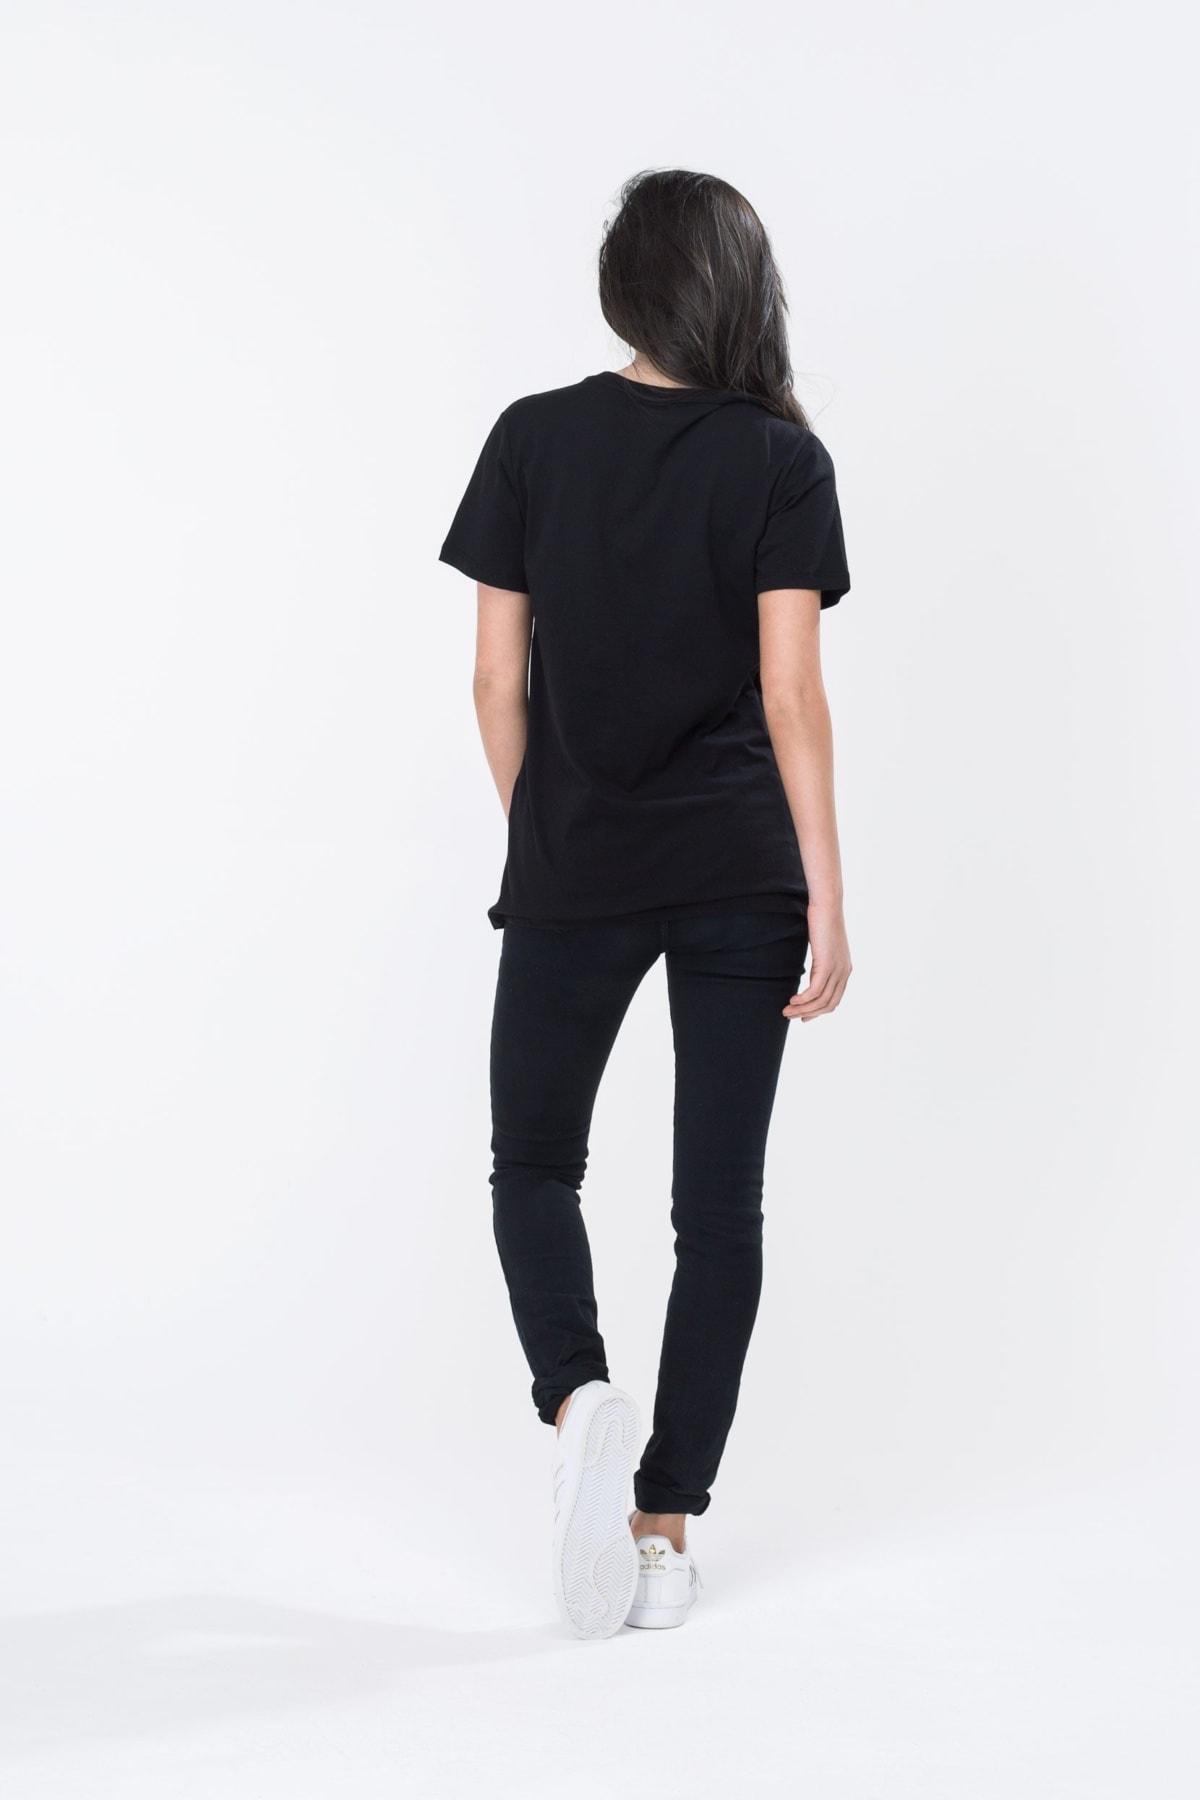 hype-blackwhite-hype-script-womens-t-shirt-4_2000x